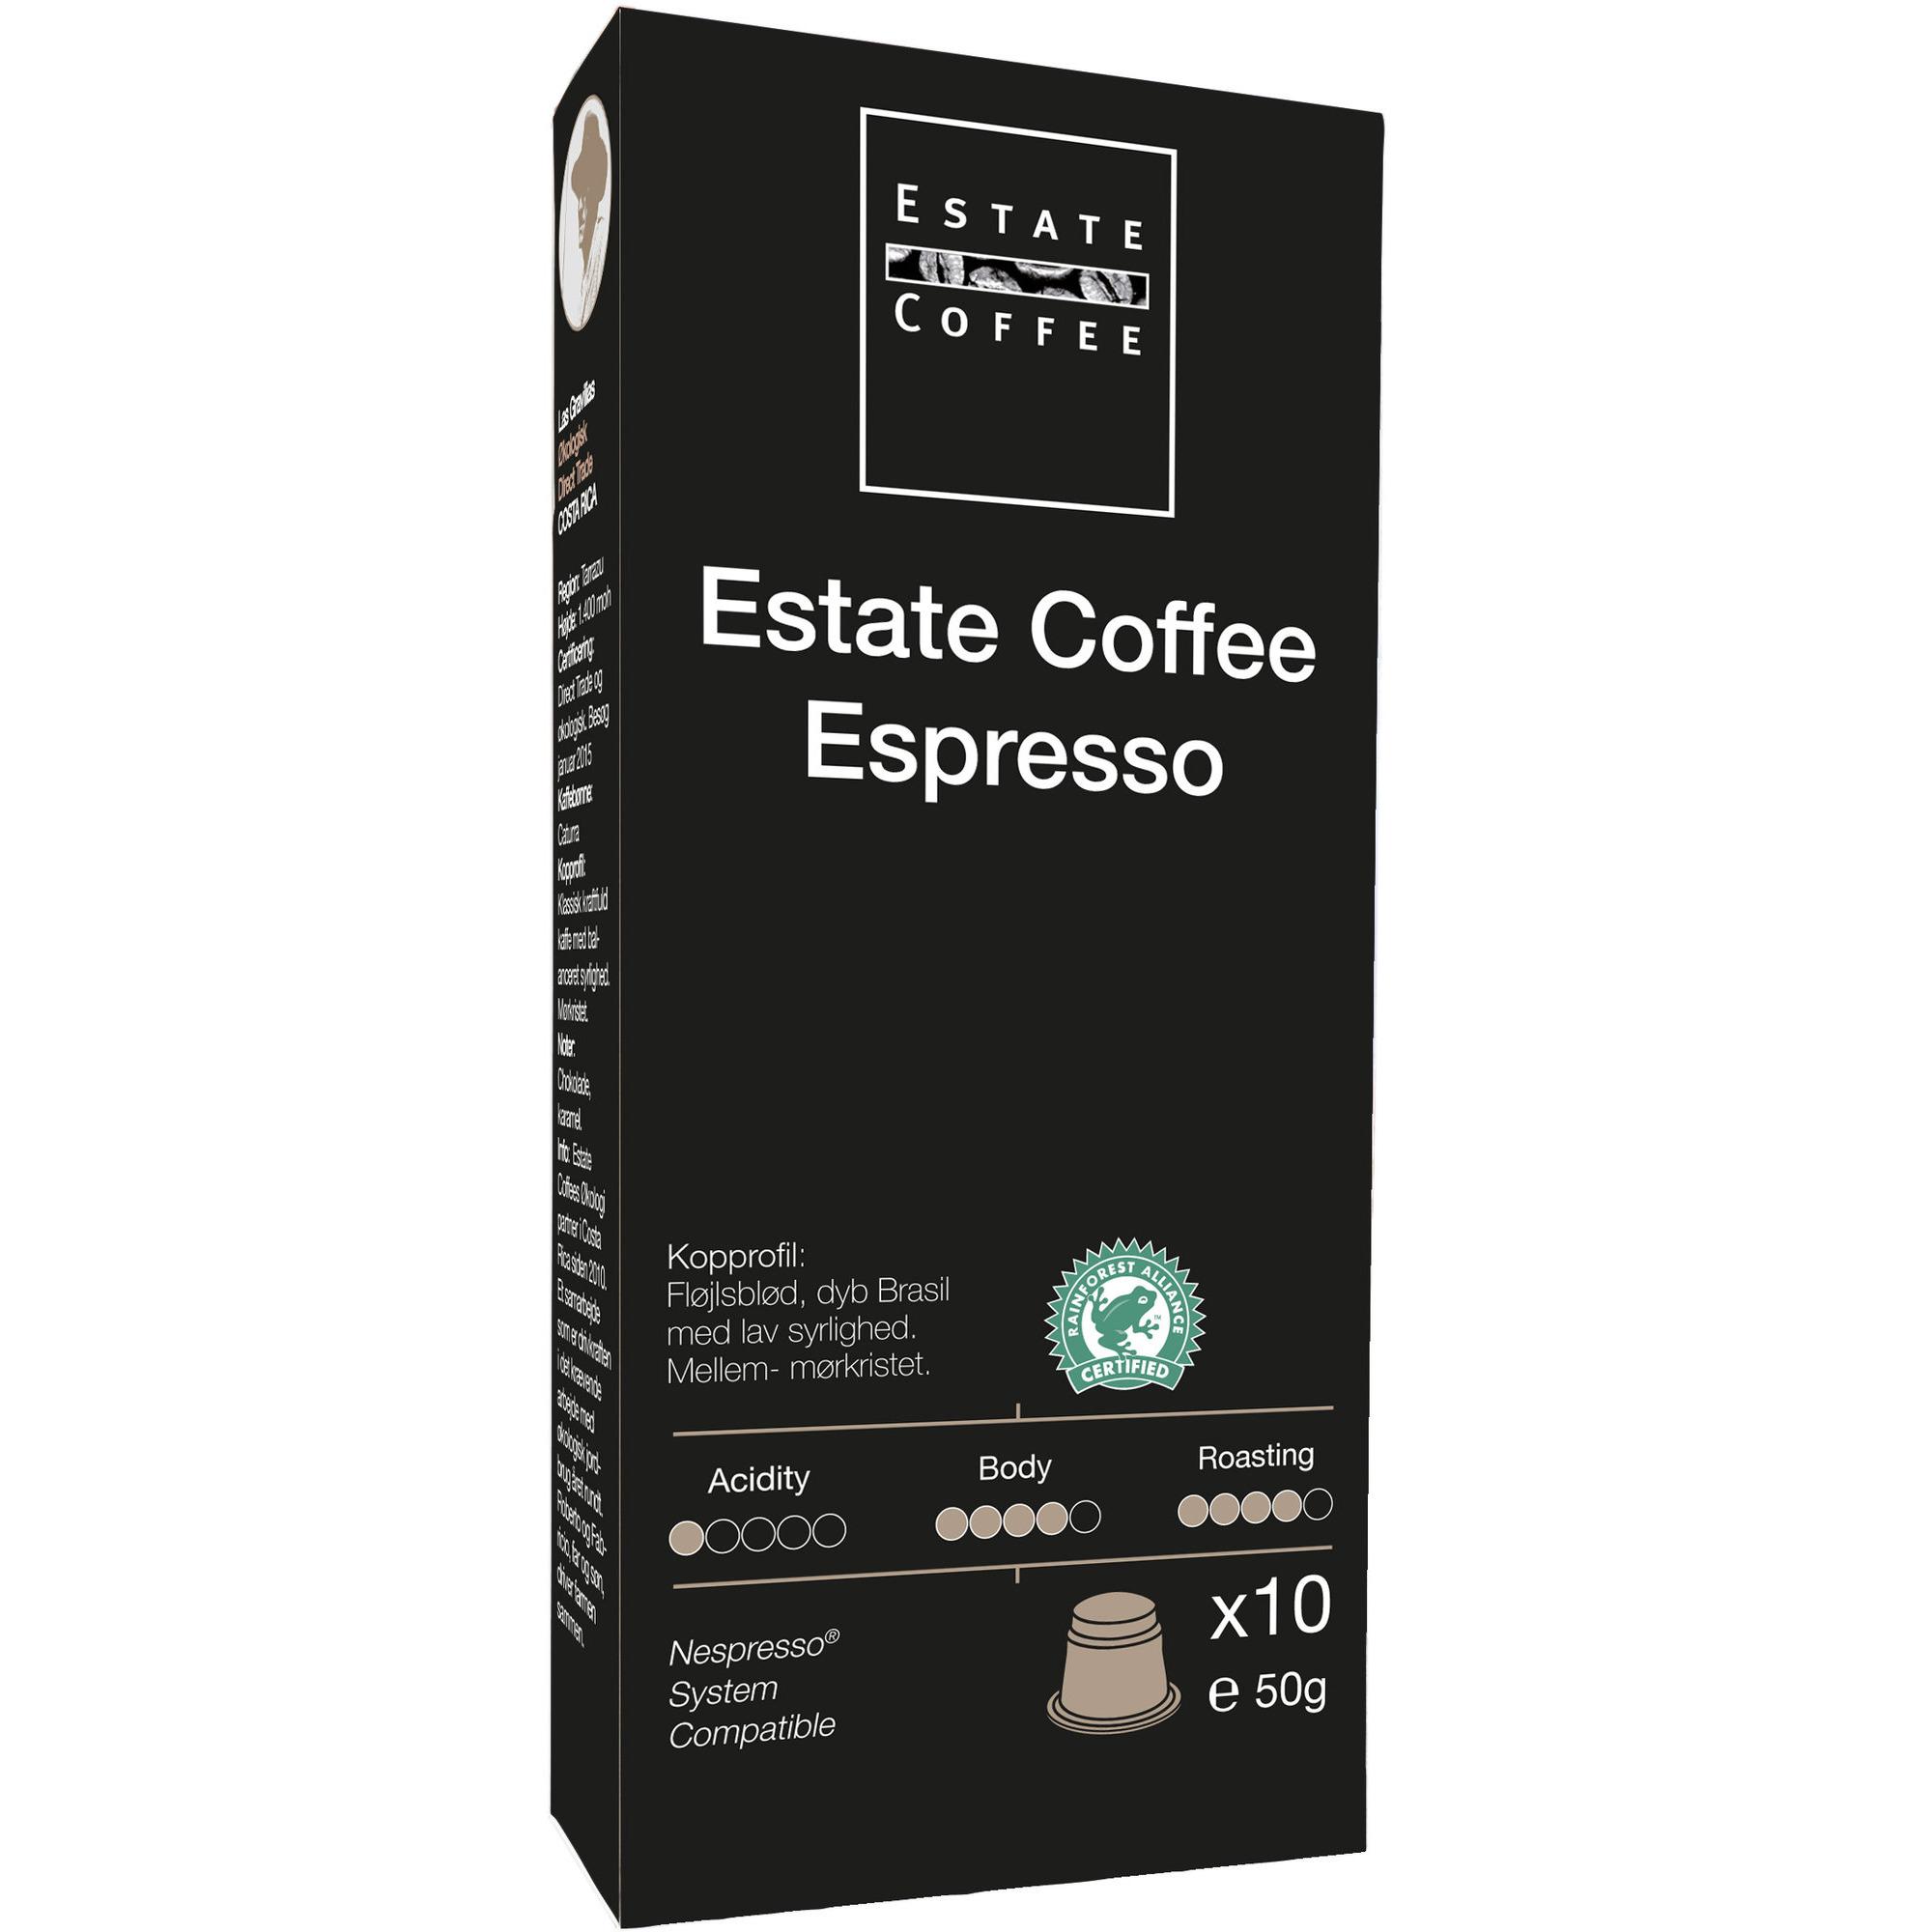 Estate Coffee Espresso Kaffekapslar